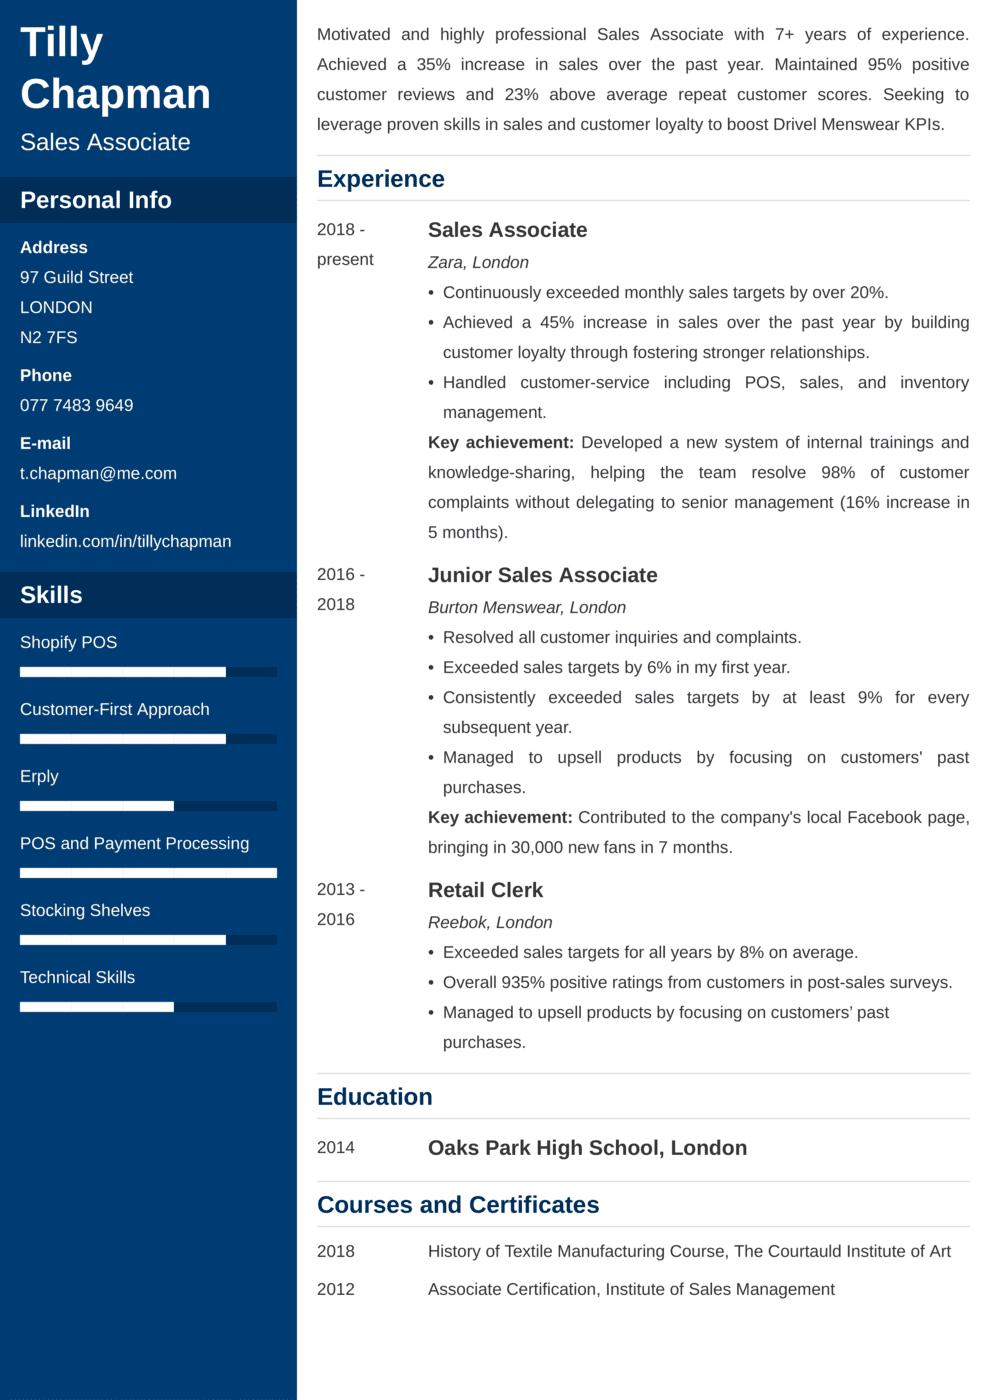 Sales Associate CV Example